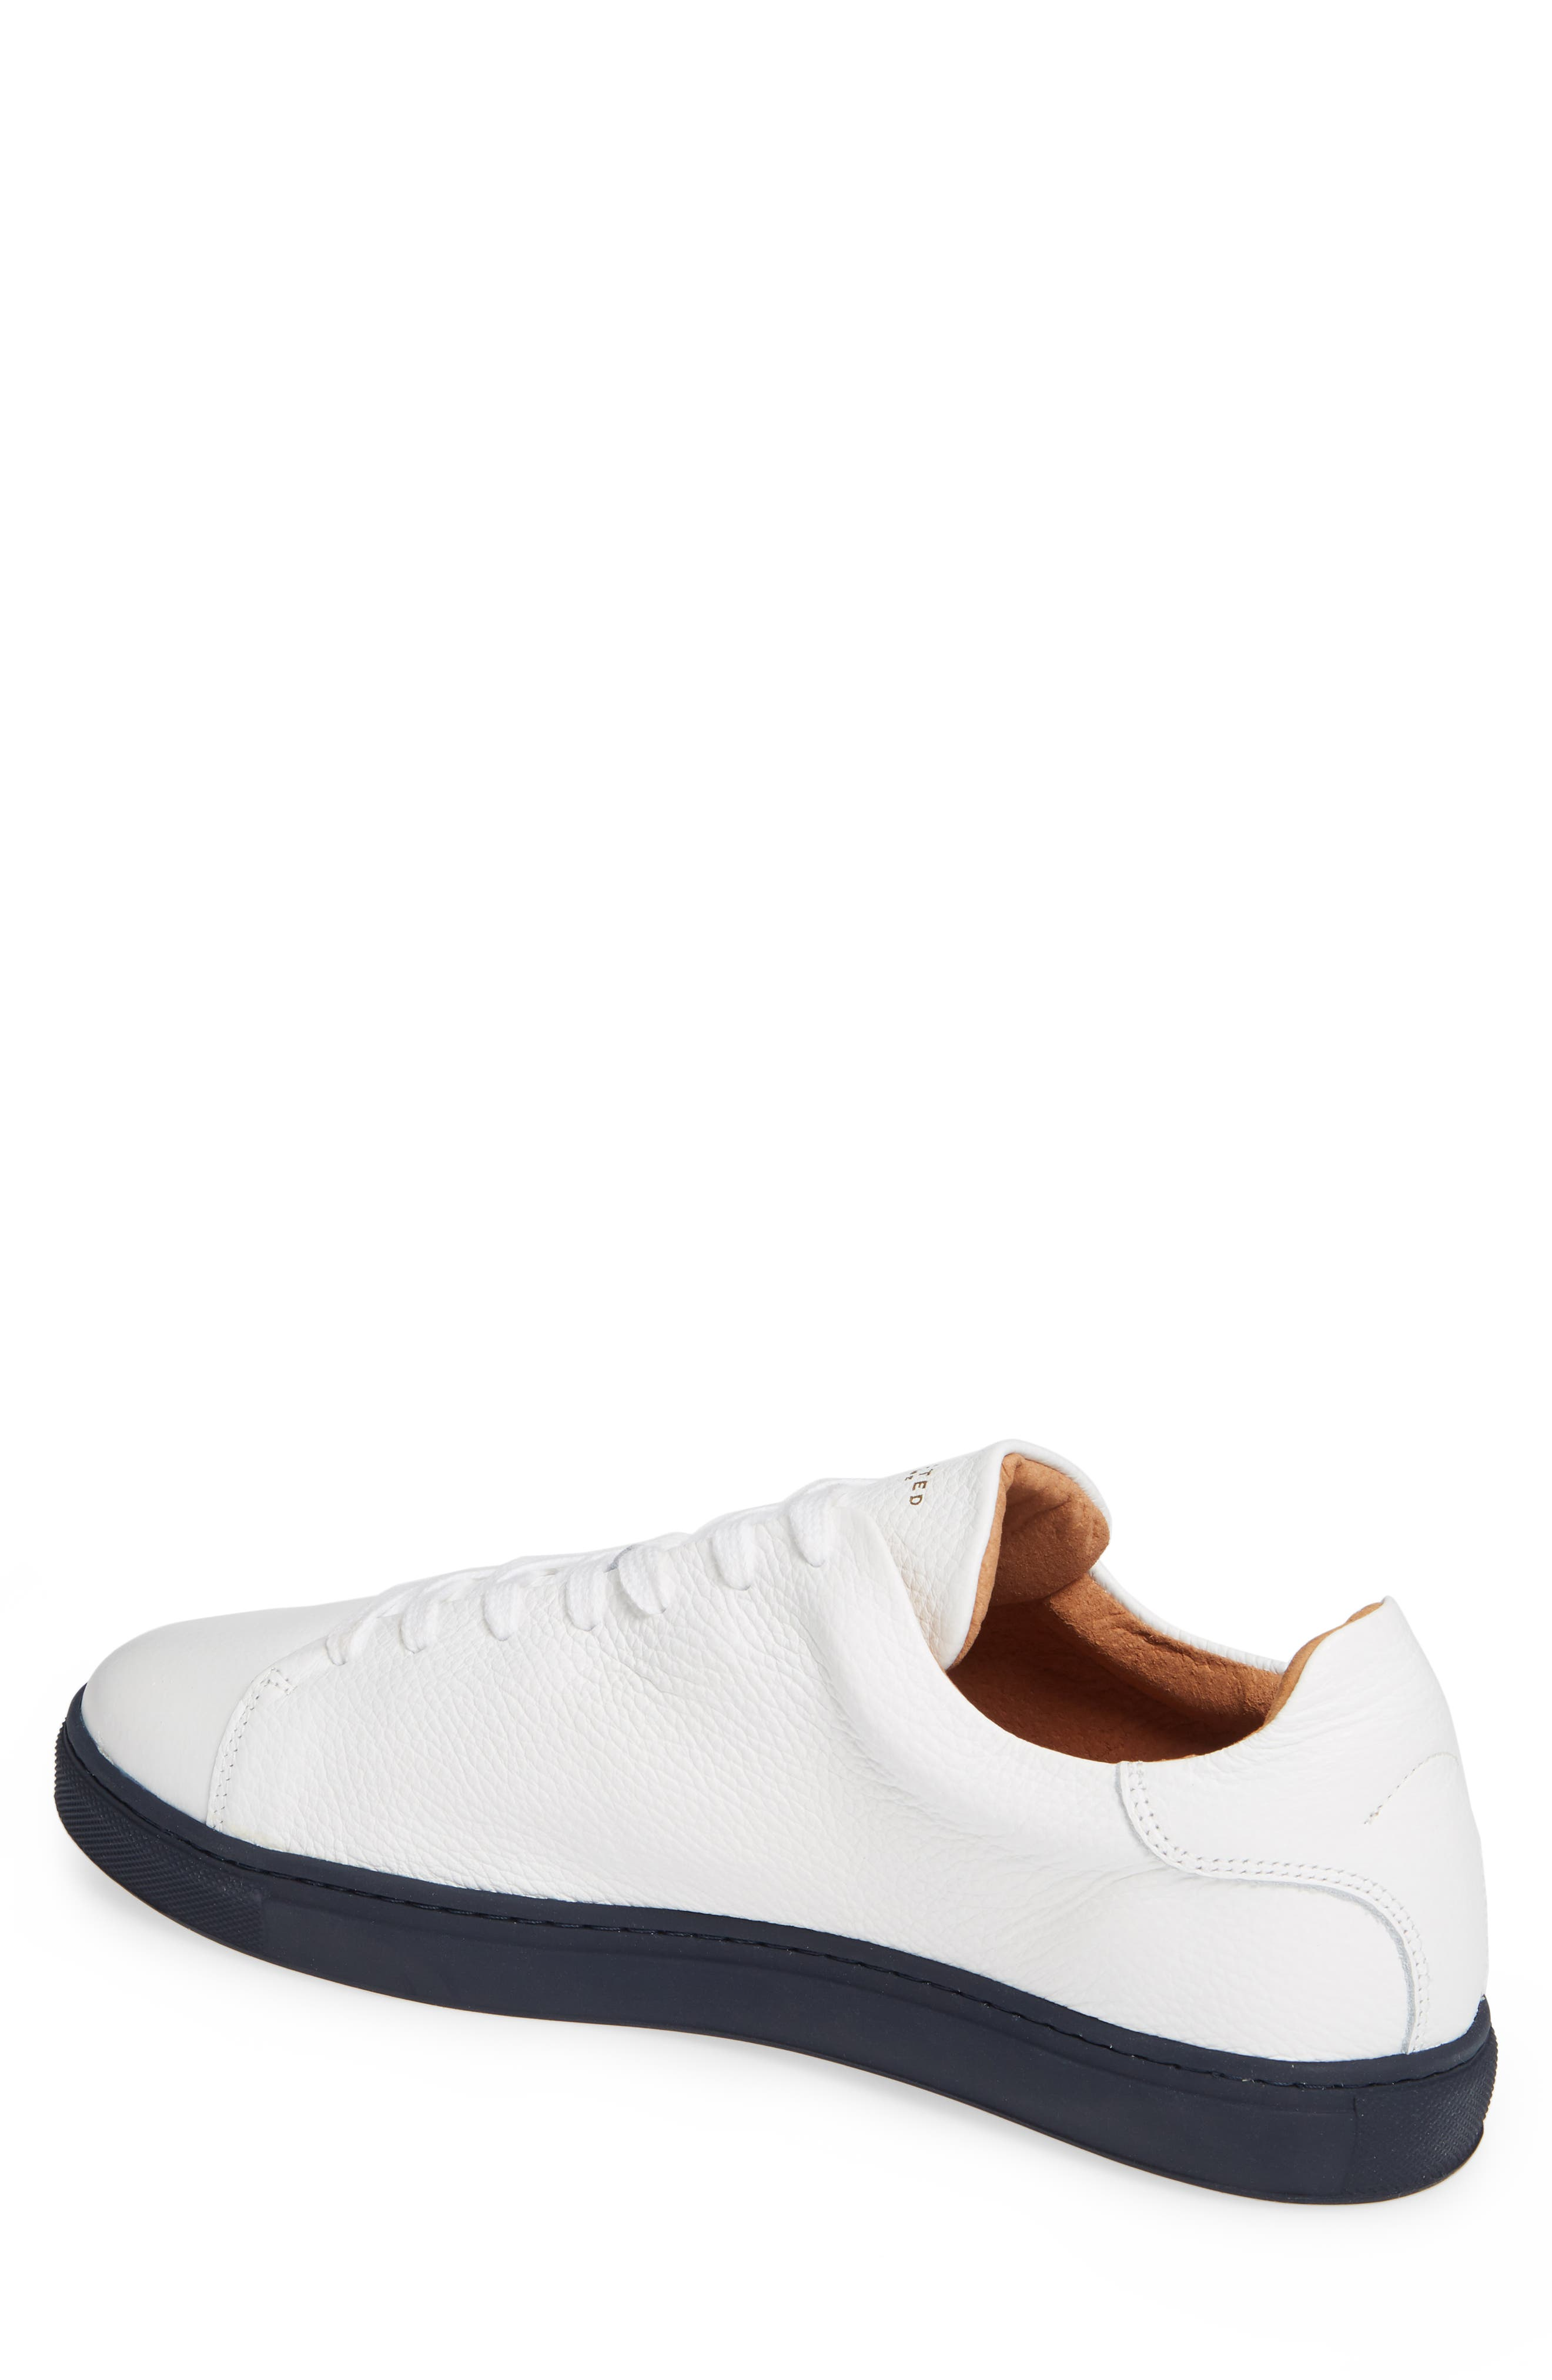 David Sneaker,                             Alternate thumbnail 2, color,                             WHITE/ DARK NAVY SOLE